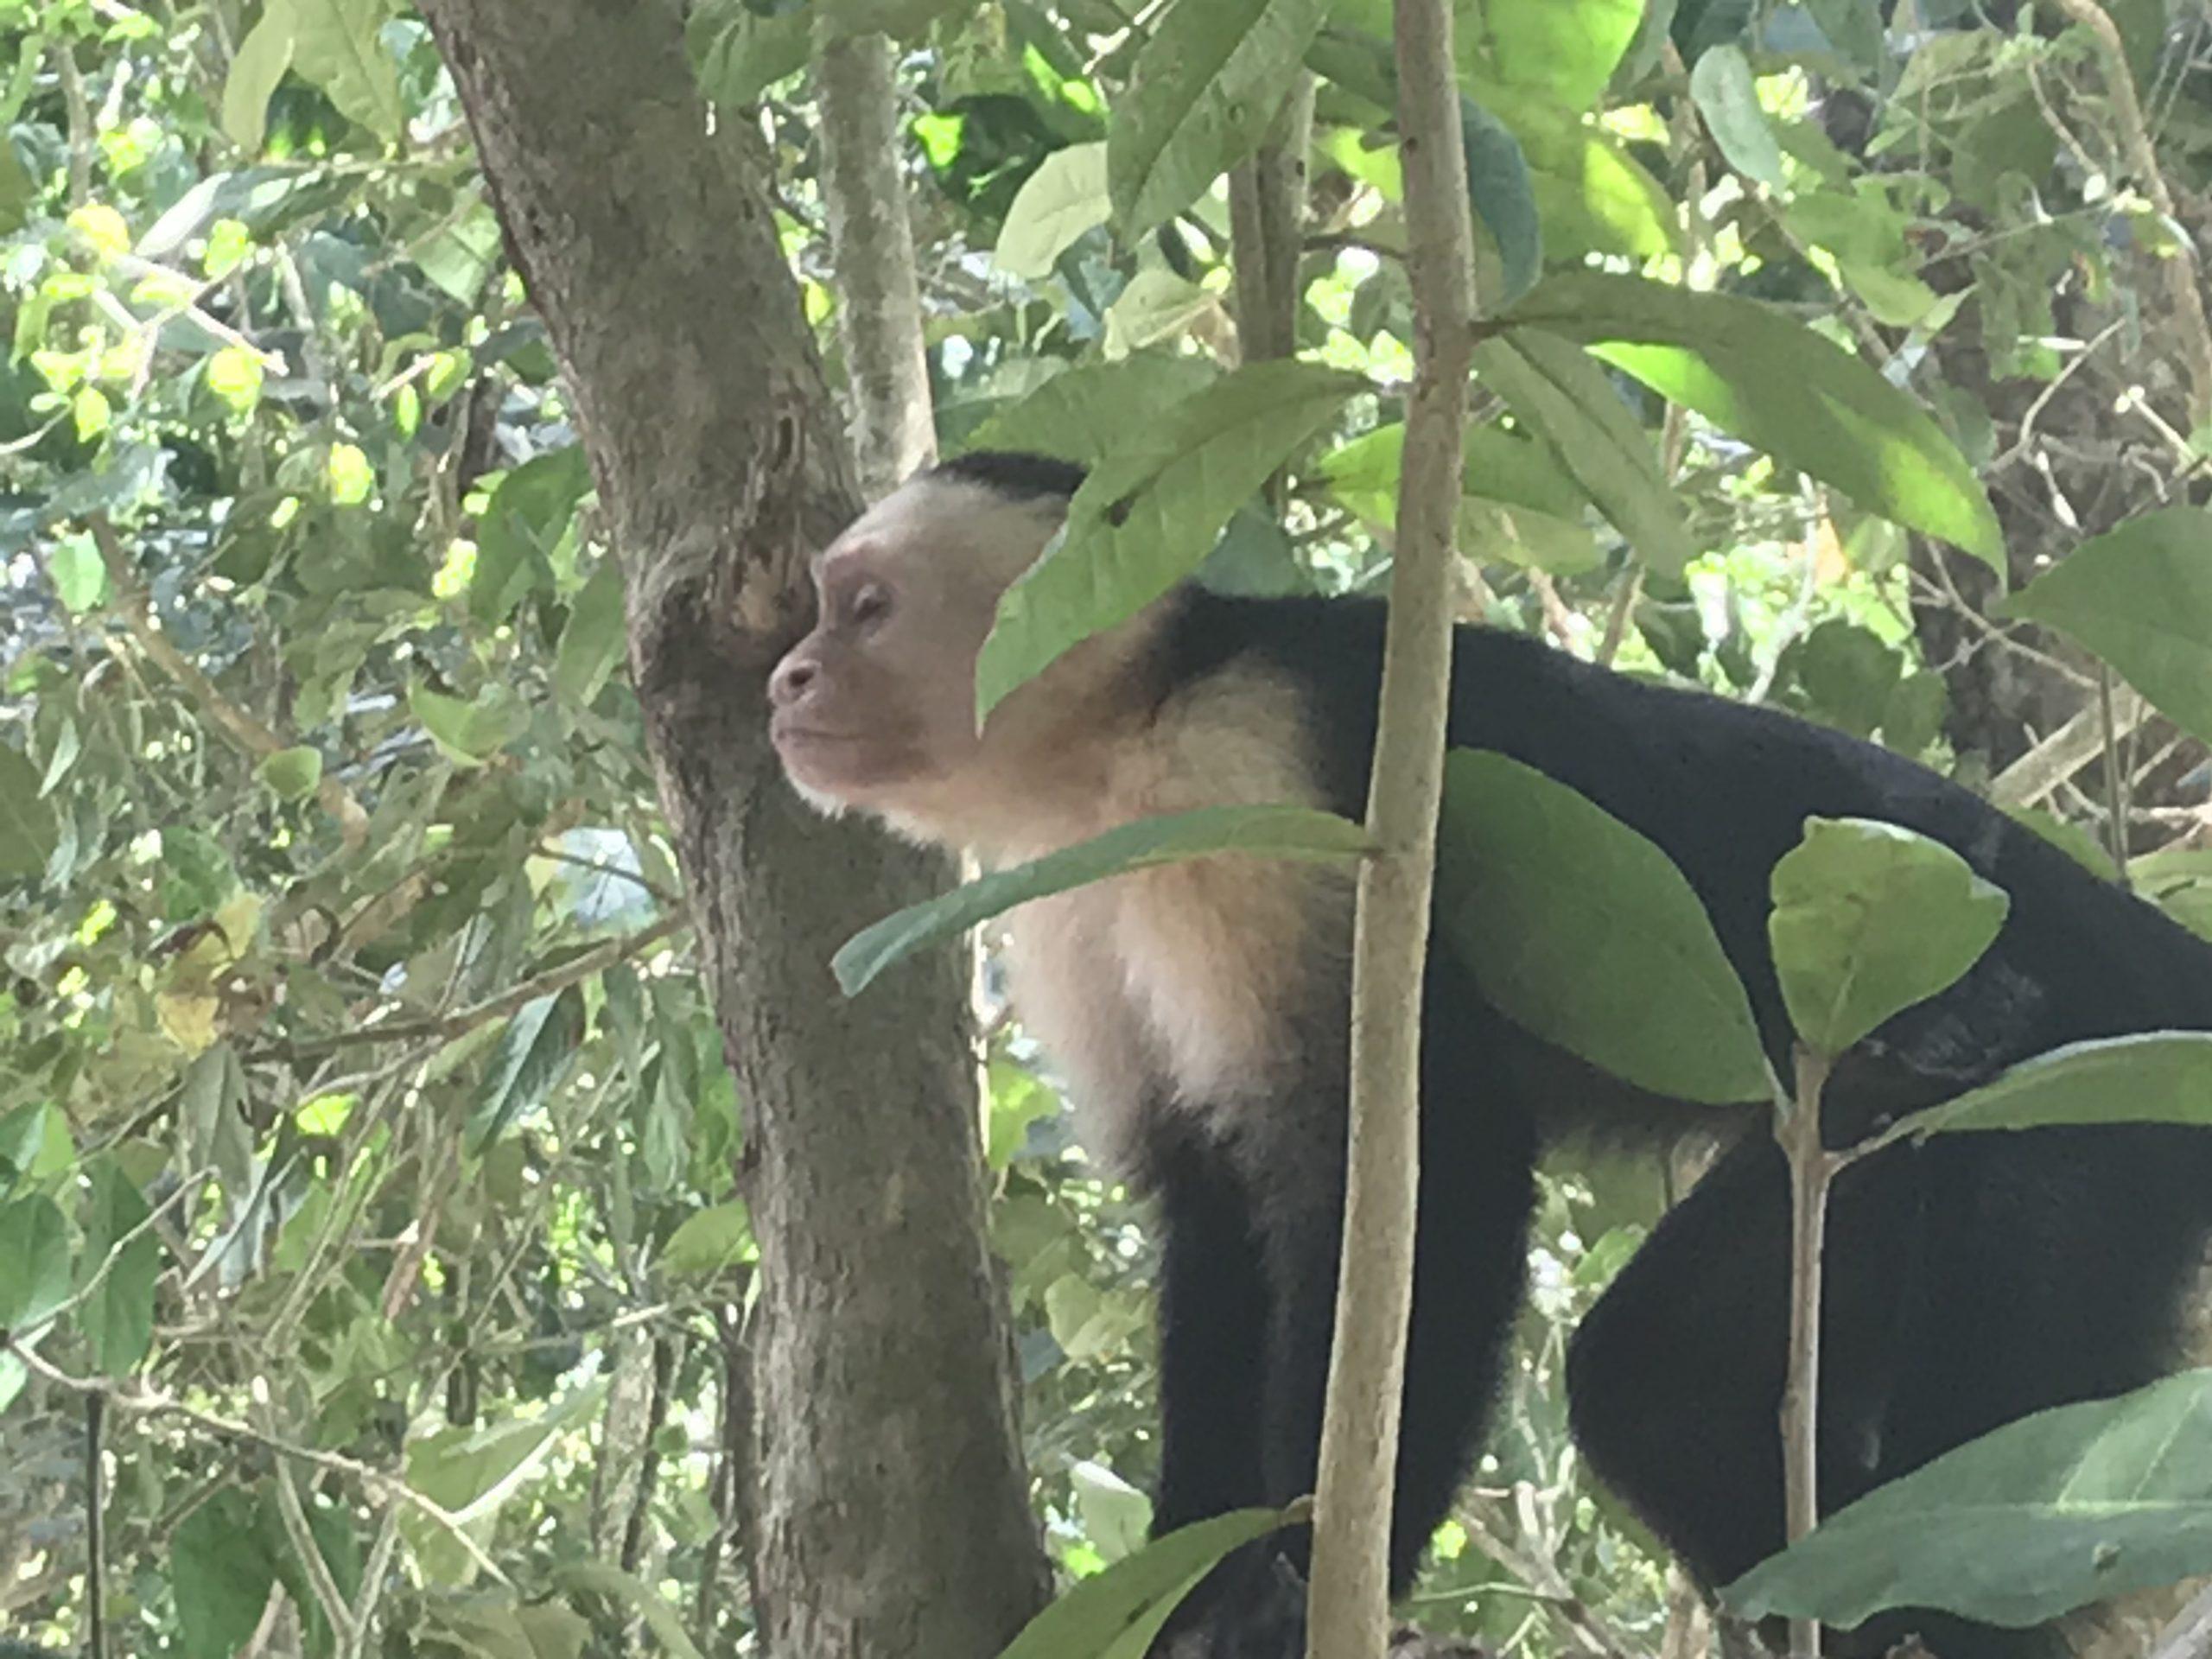 Costa Rica: Manuel-Antonio-National-Park and Quepos